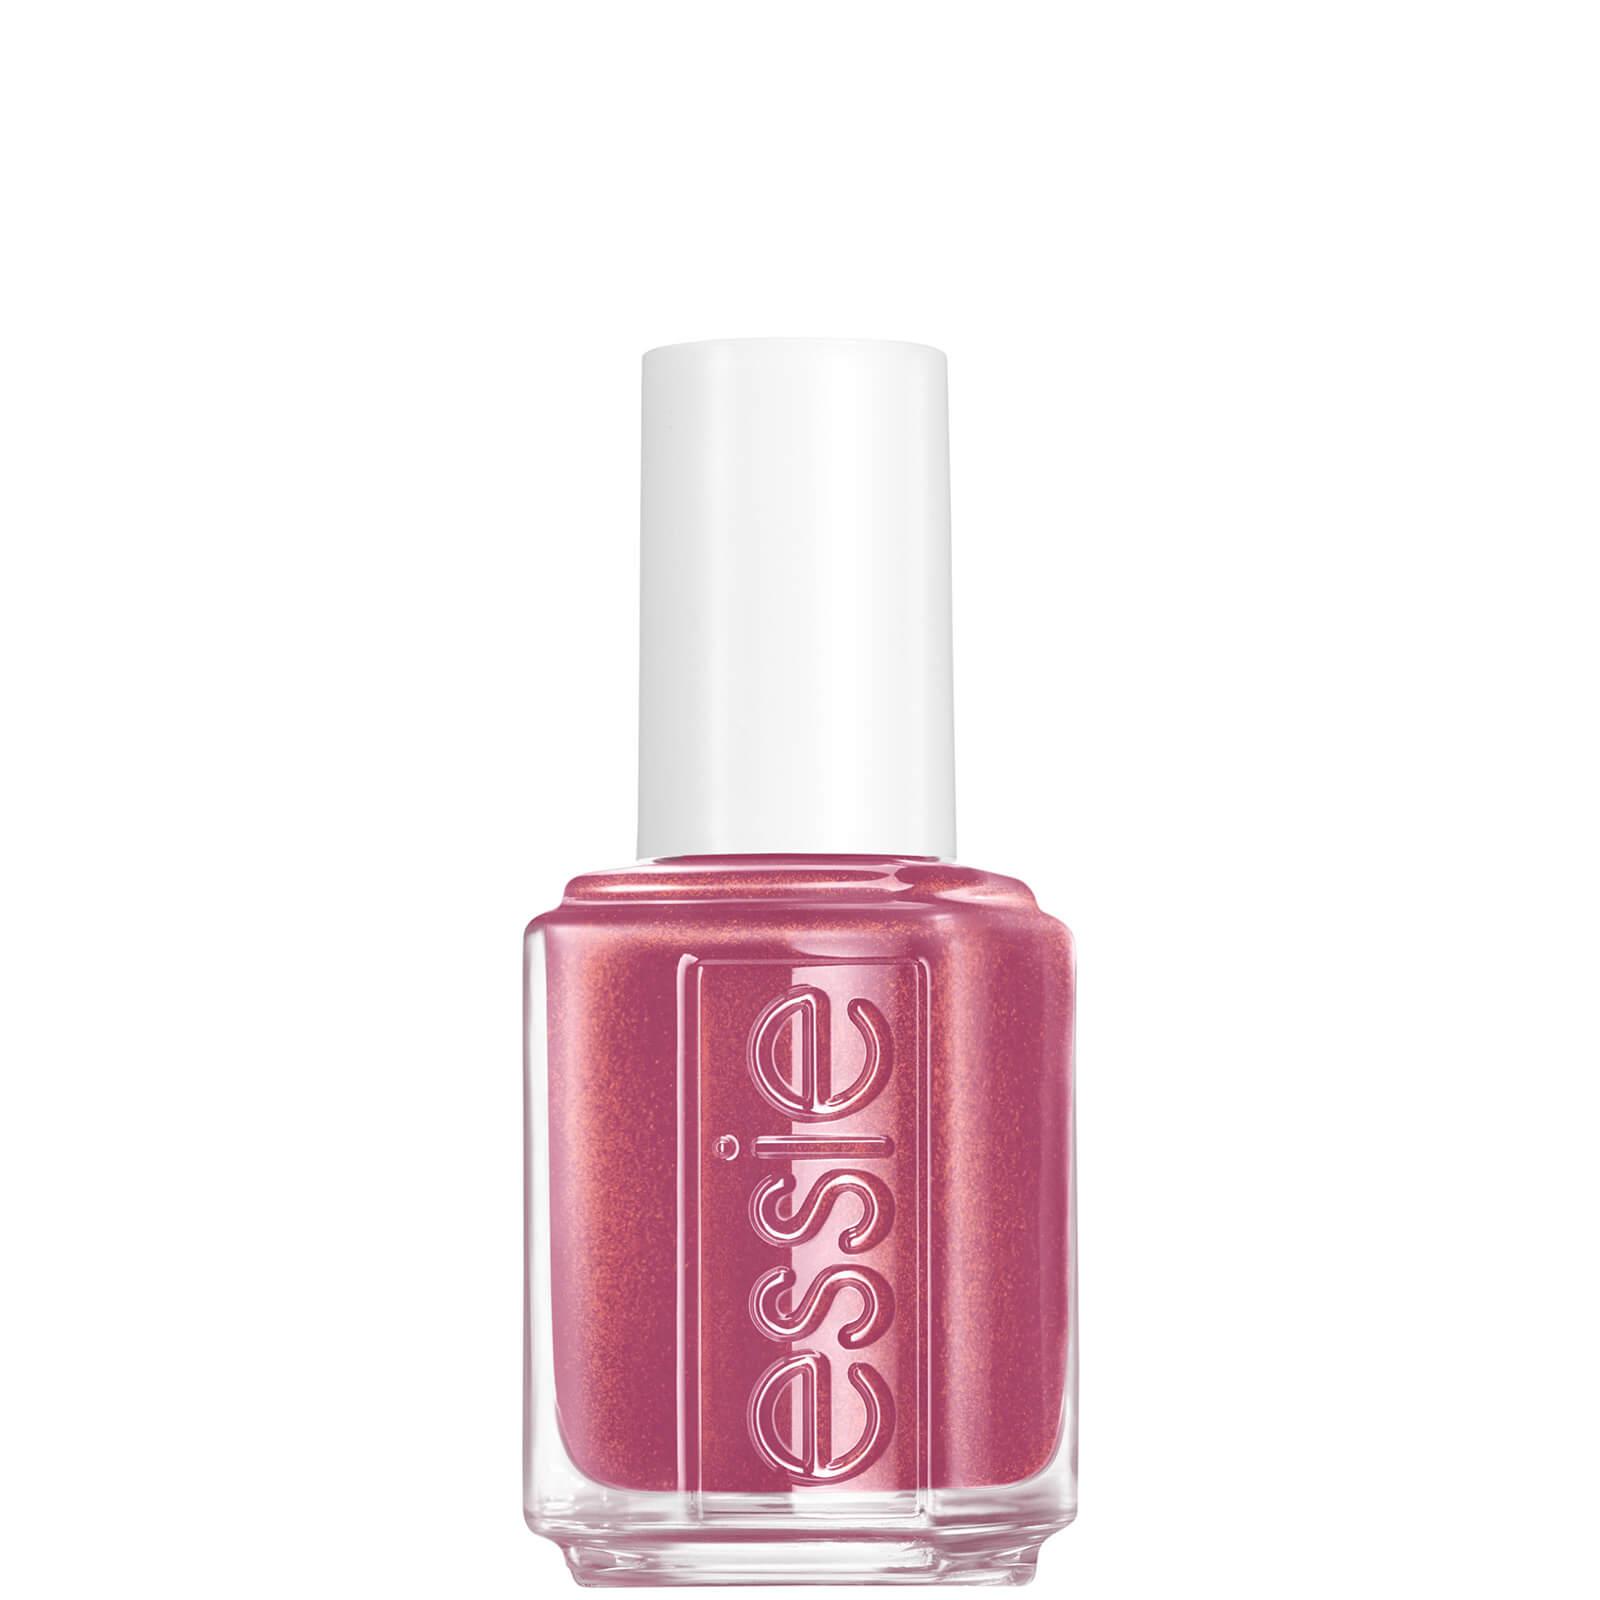 Купить Essie Core Nail Polish 13.5ml (Various Shades) - 785 Ferris Of Them All